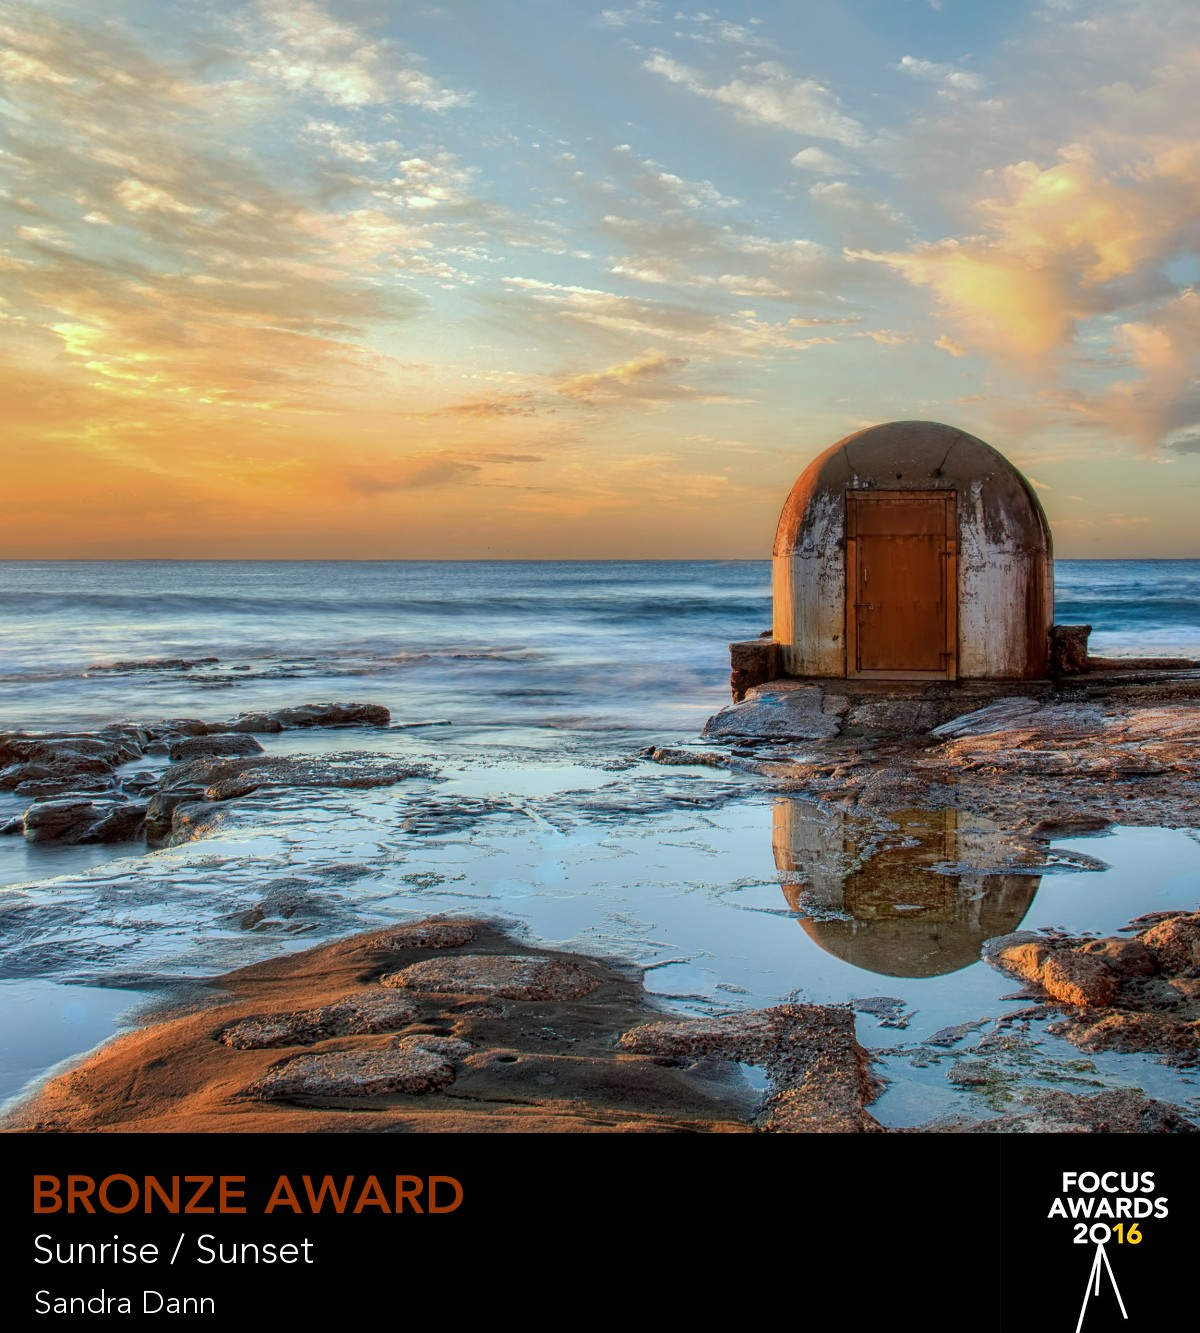 award_4569_4569_7275176807.jpg